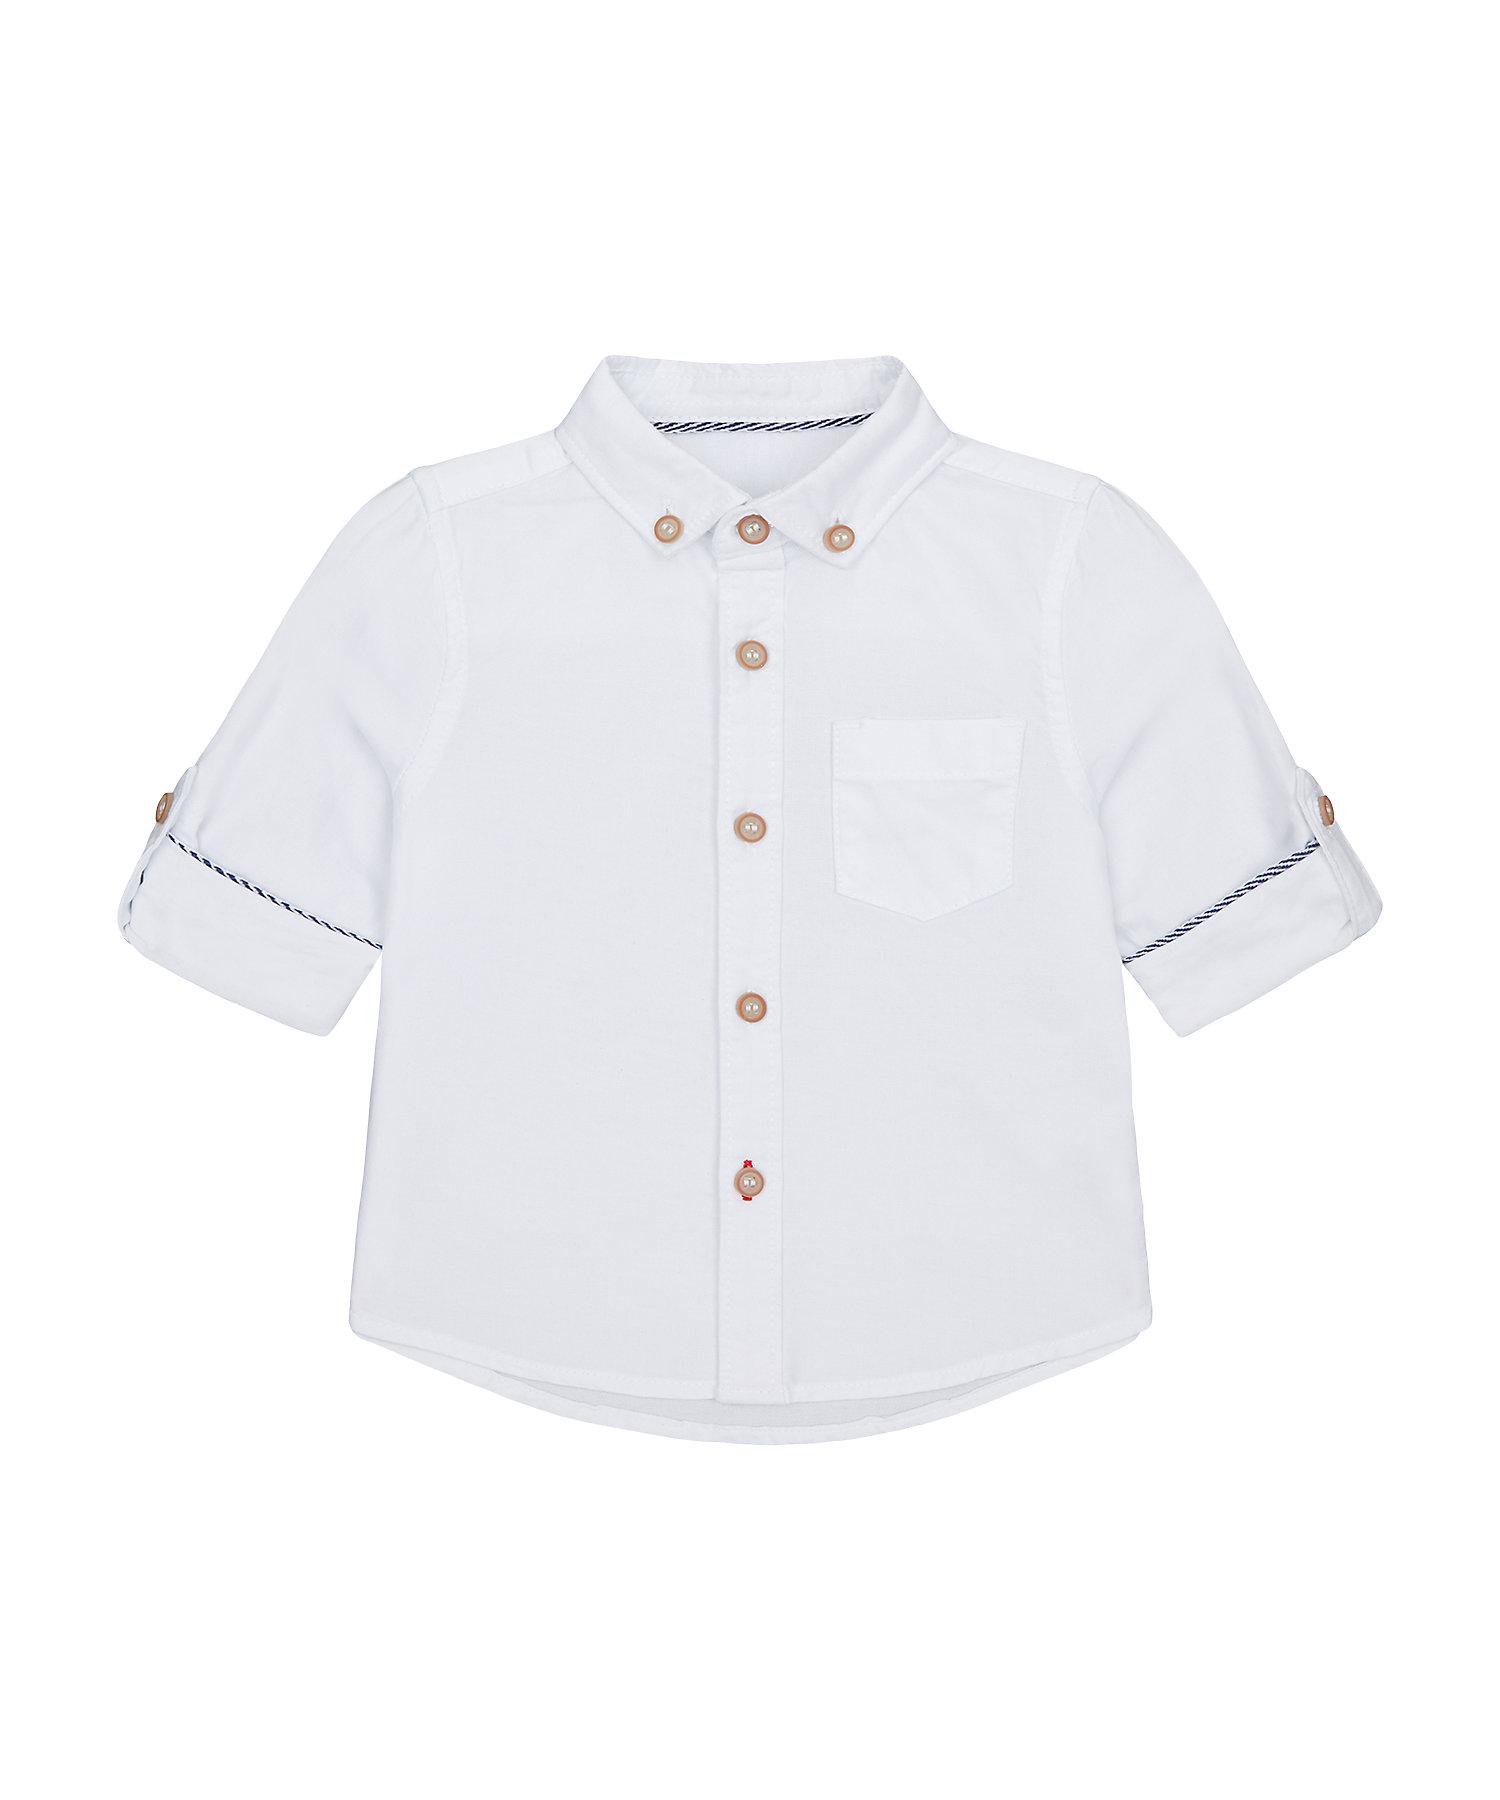 Mothercare | Boys Full Sleeves Oxford Shirt - White